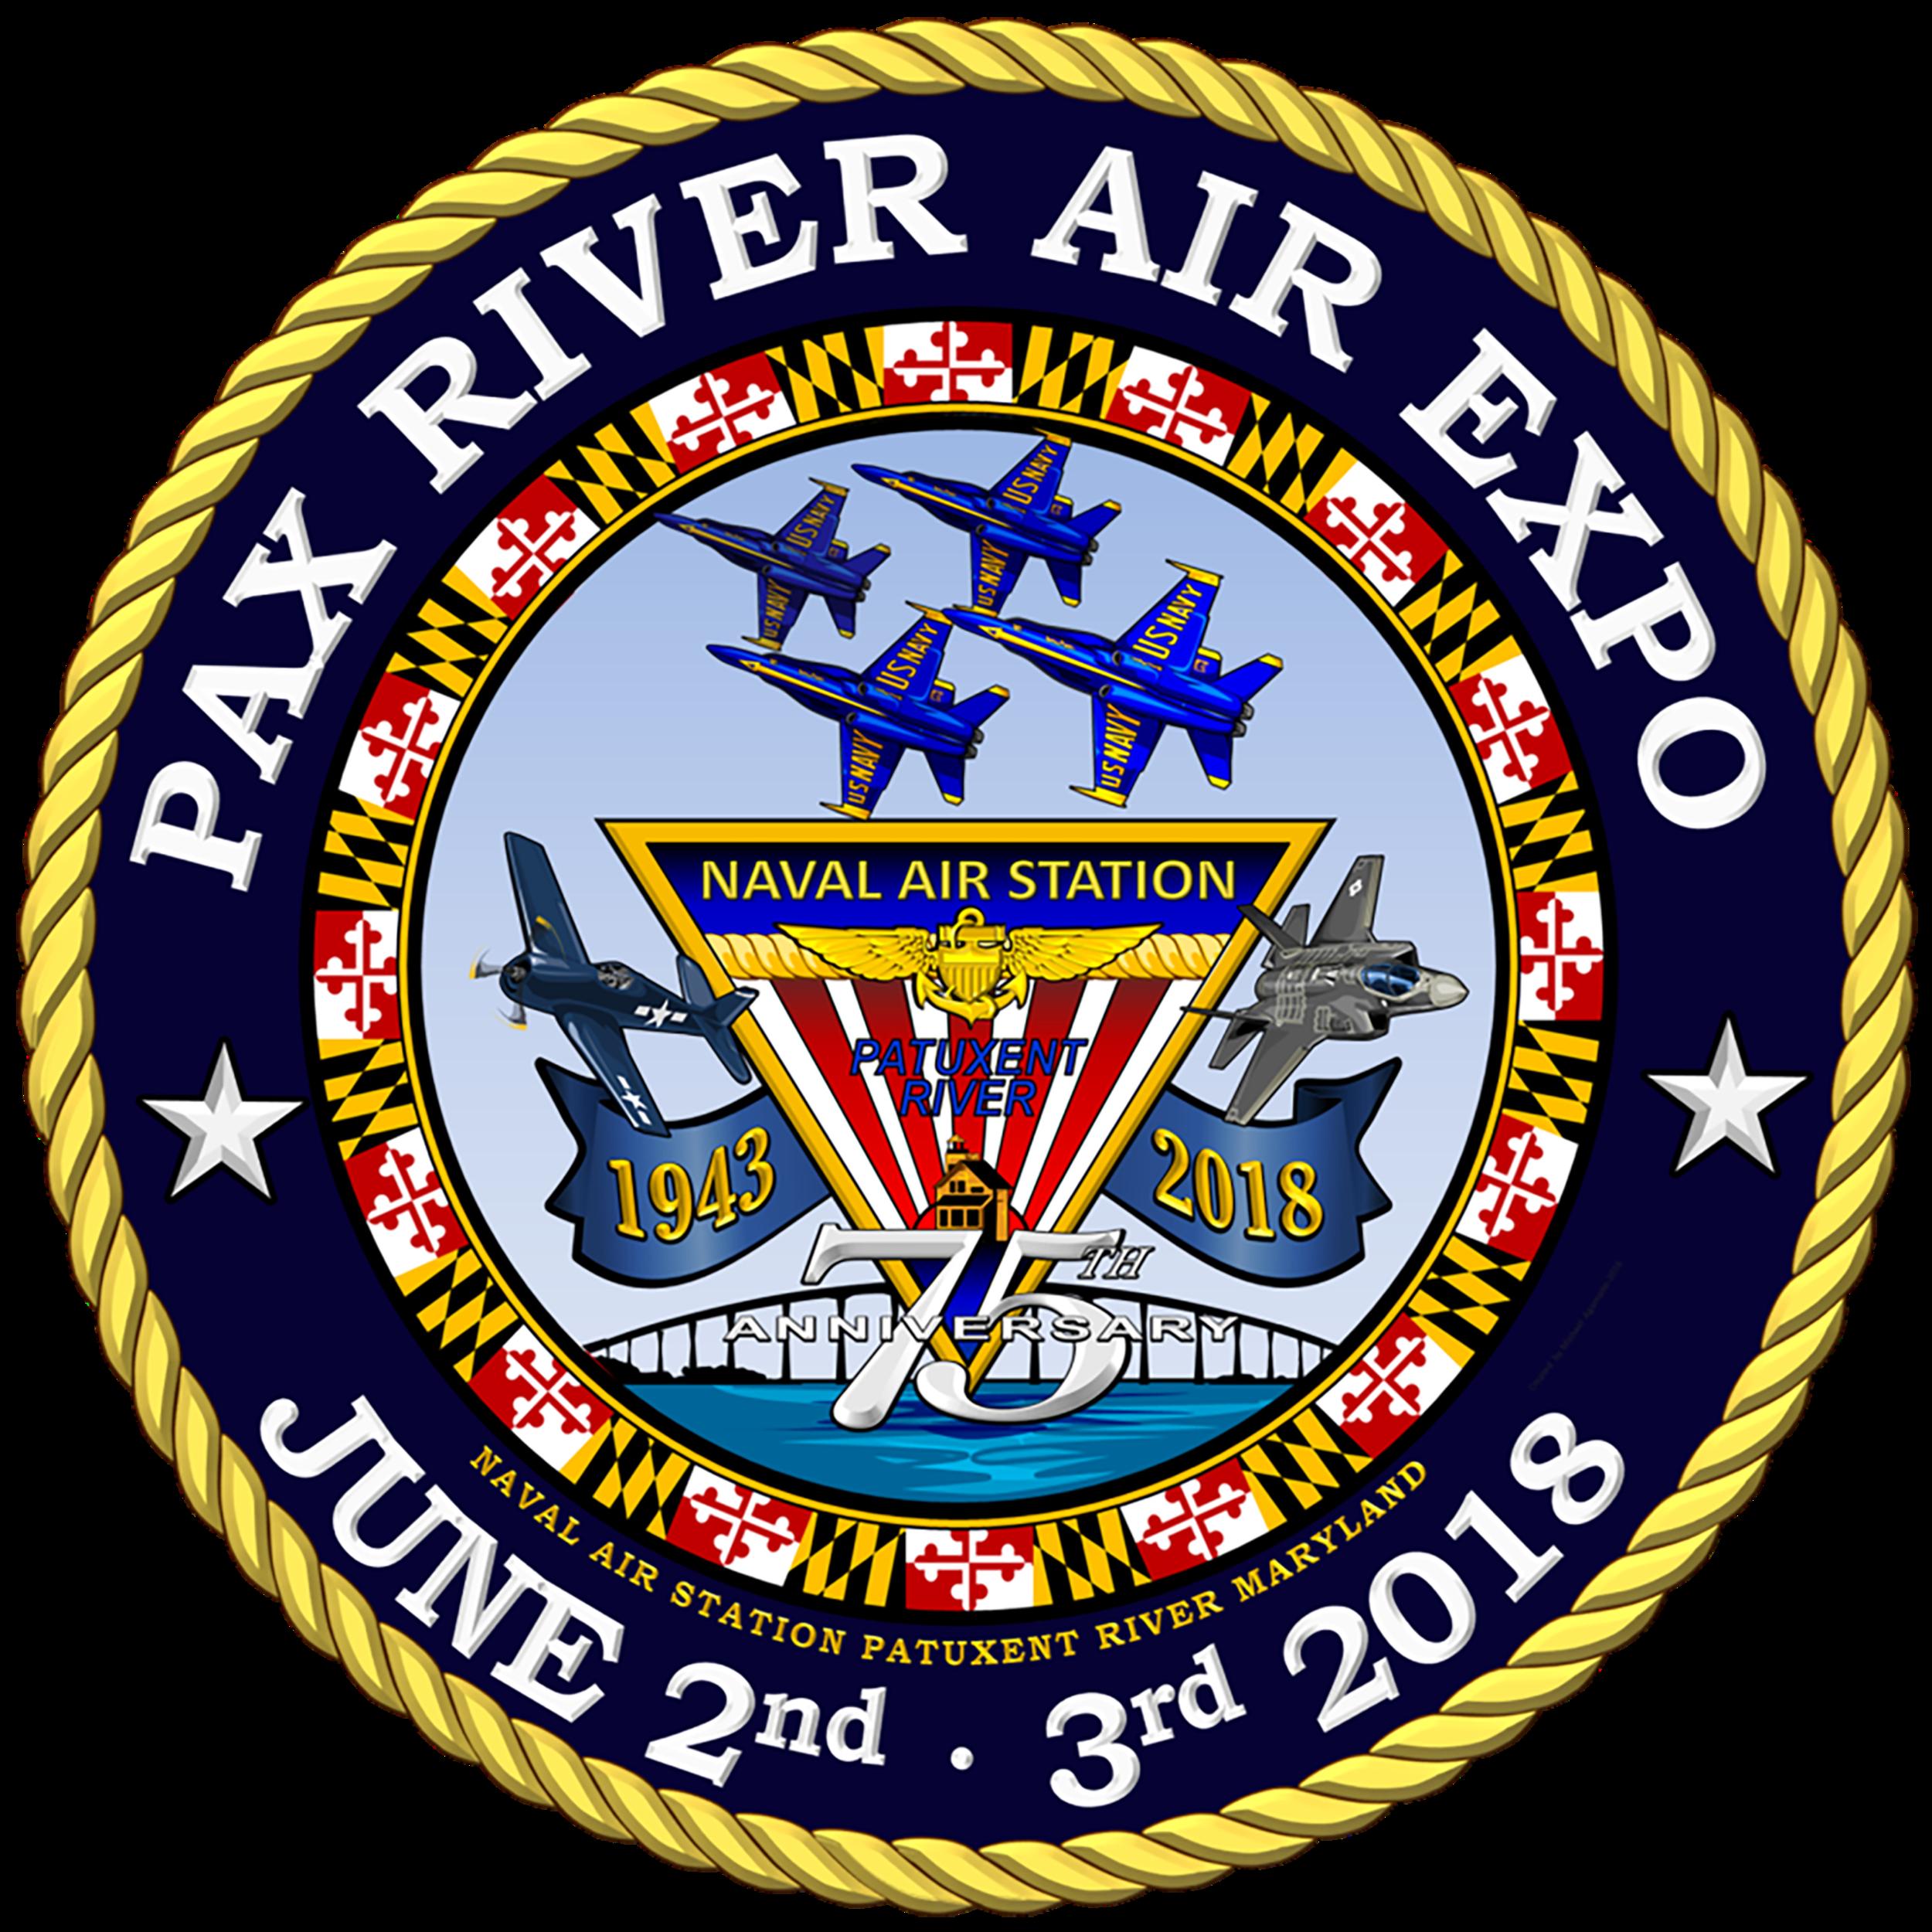 PAX River Air Expo 2018